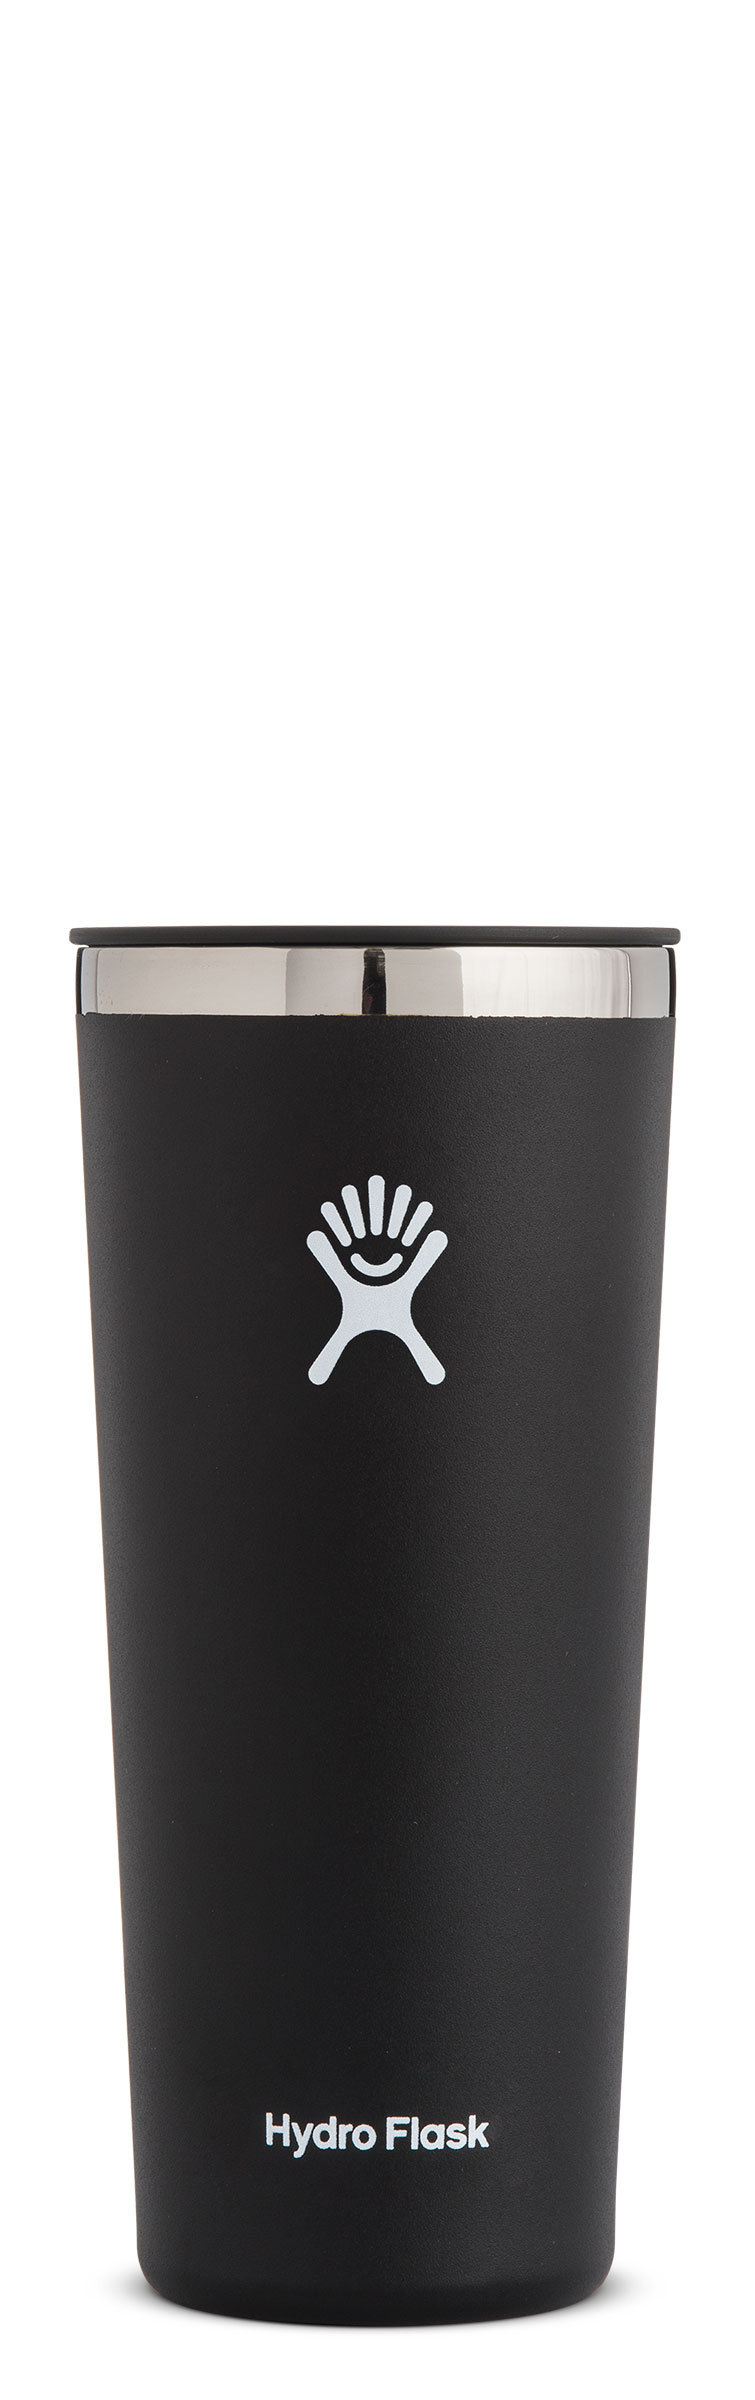 Hydro Flask 22 oz Tumbler Black